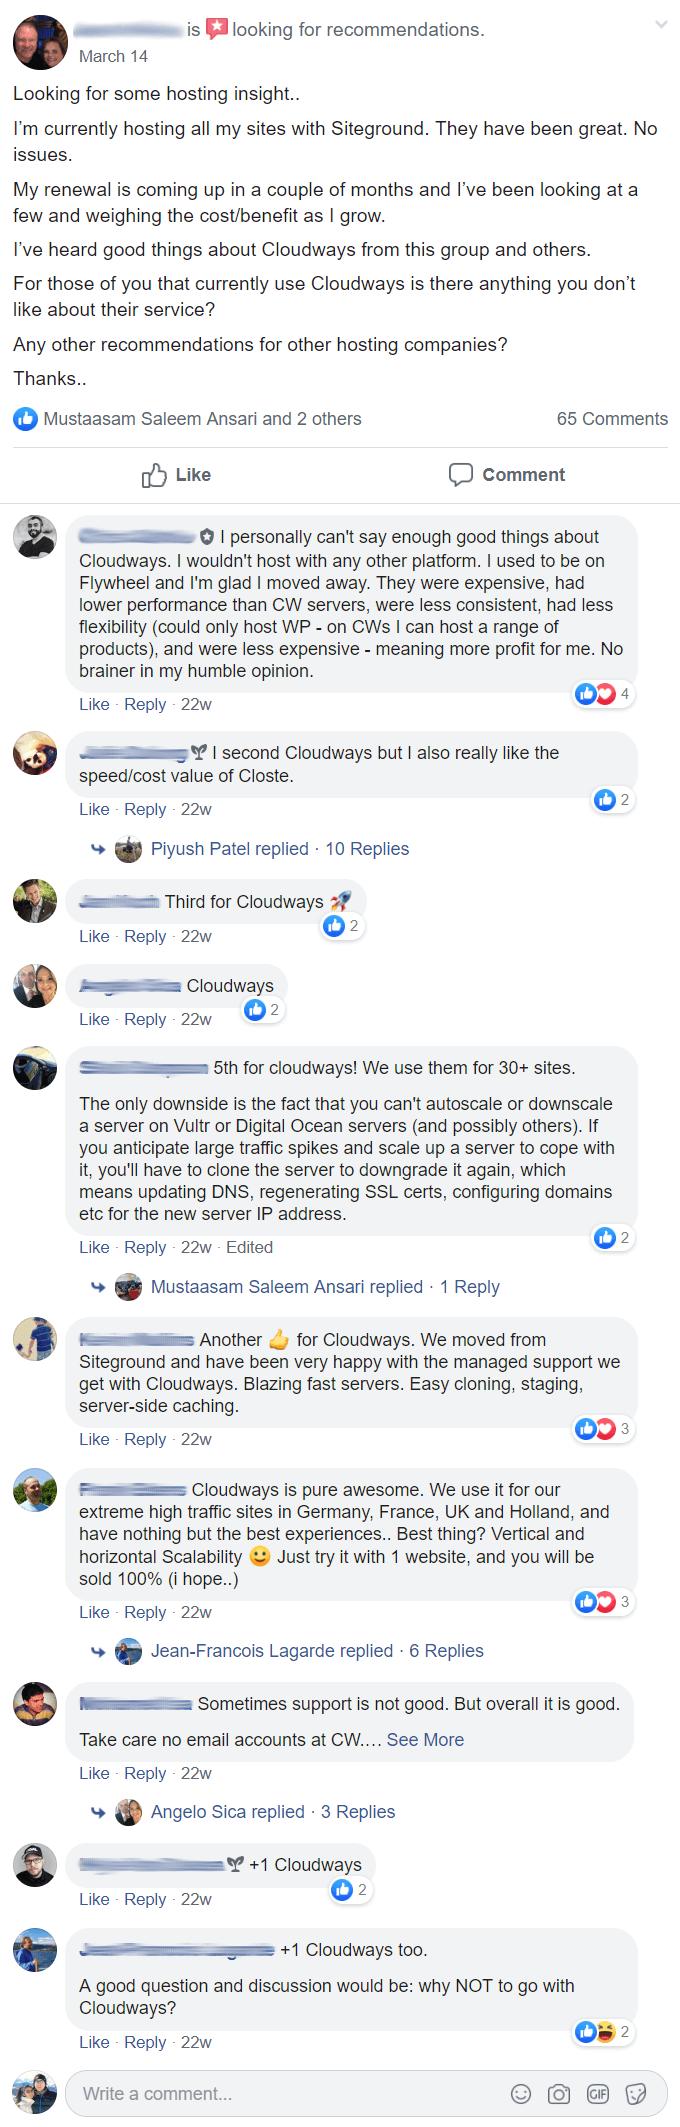 Cloudways-Feedback-in-Facebok-Groups